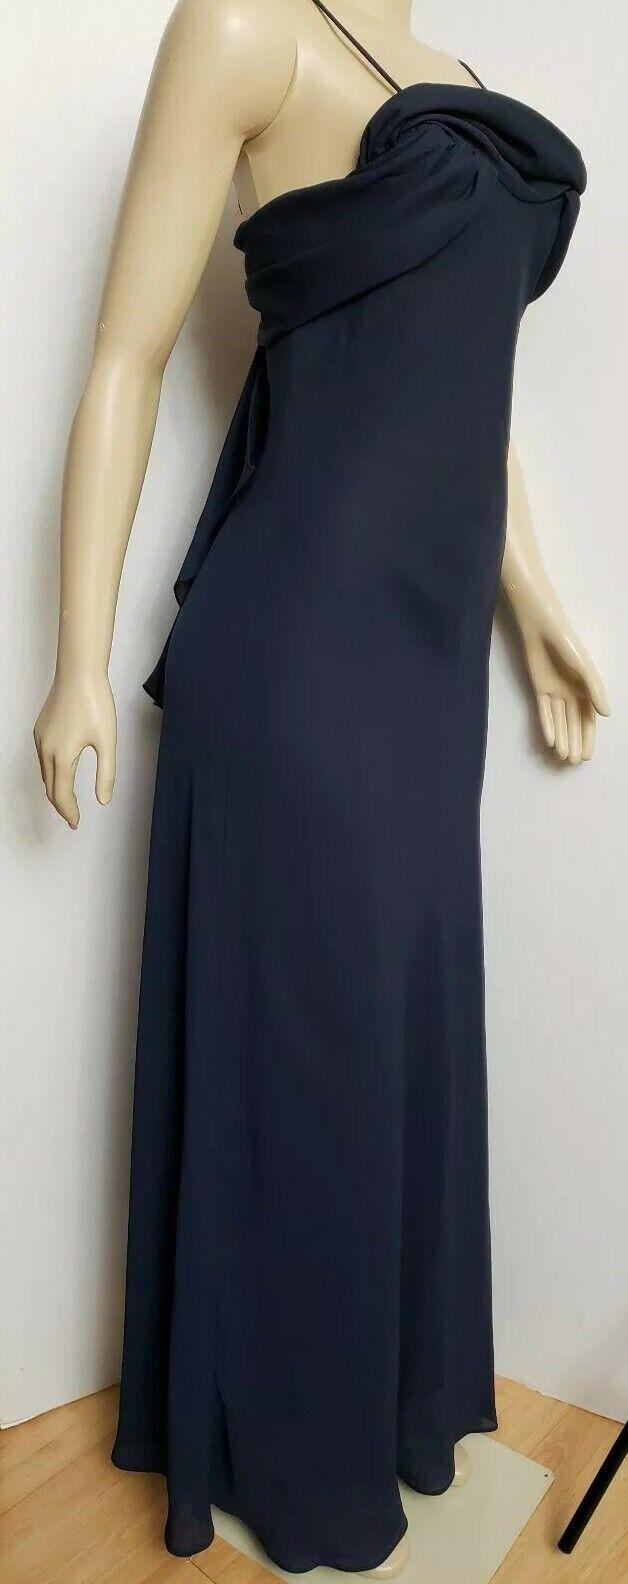 Betsy & Adam by Jaslene dress maxi formal sheath ruffle Spaghetti straps Size 10